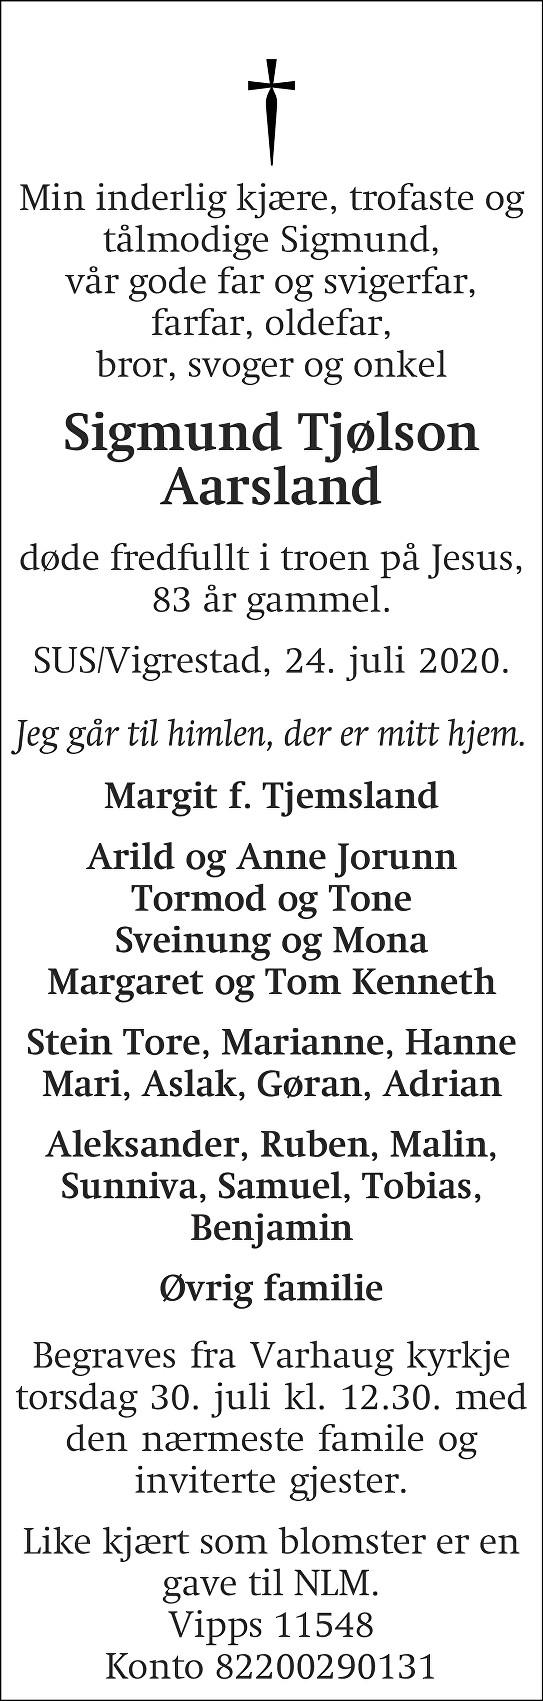 Sigmund Tjølson Aarsland Dødsannonse